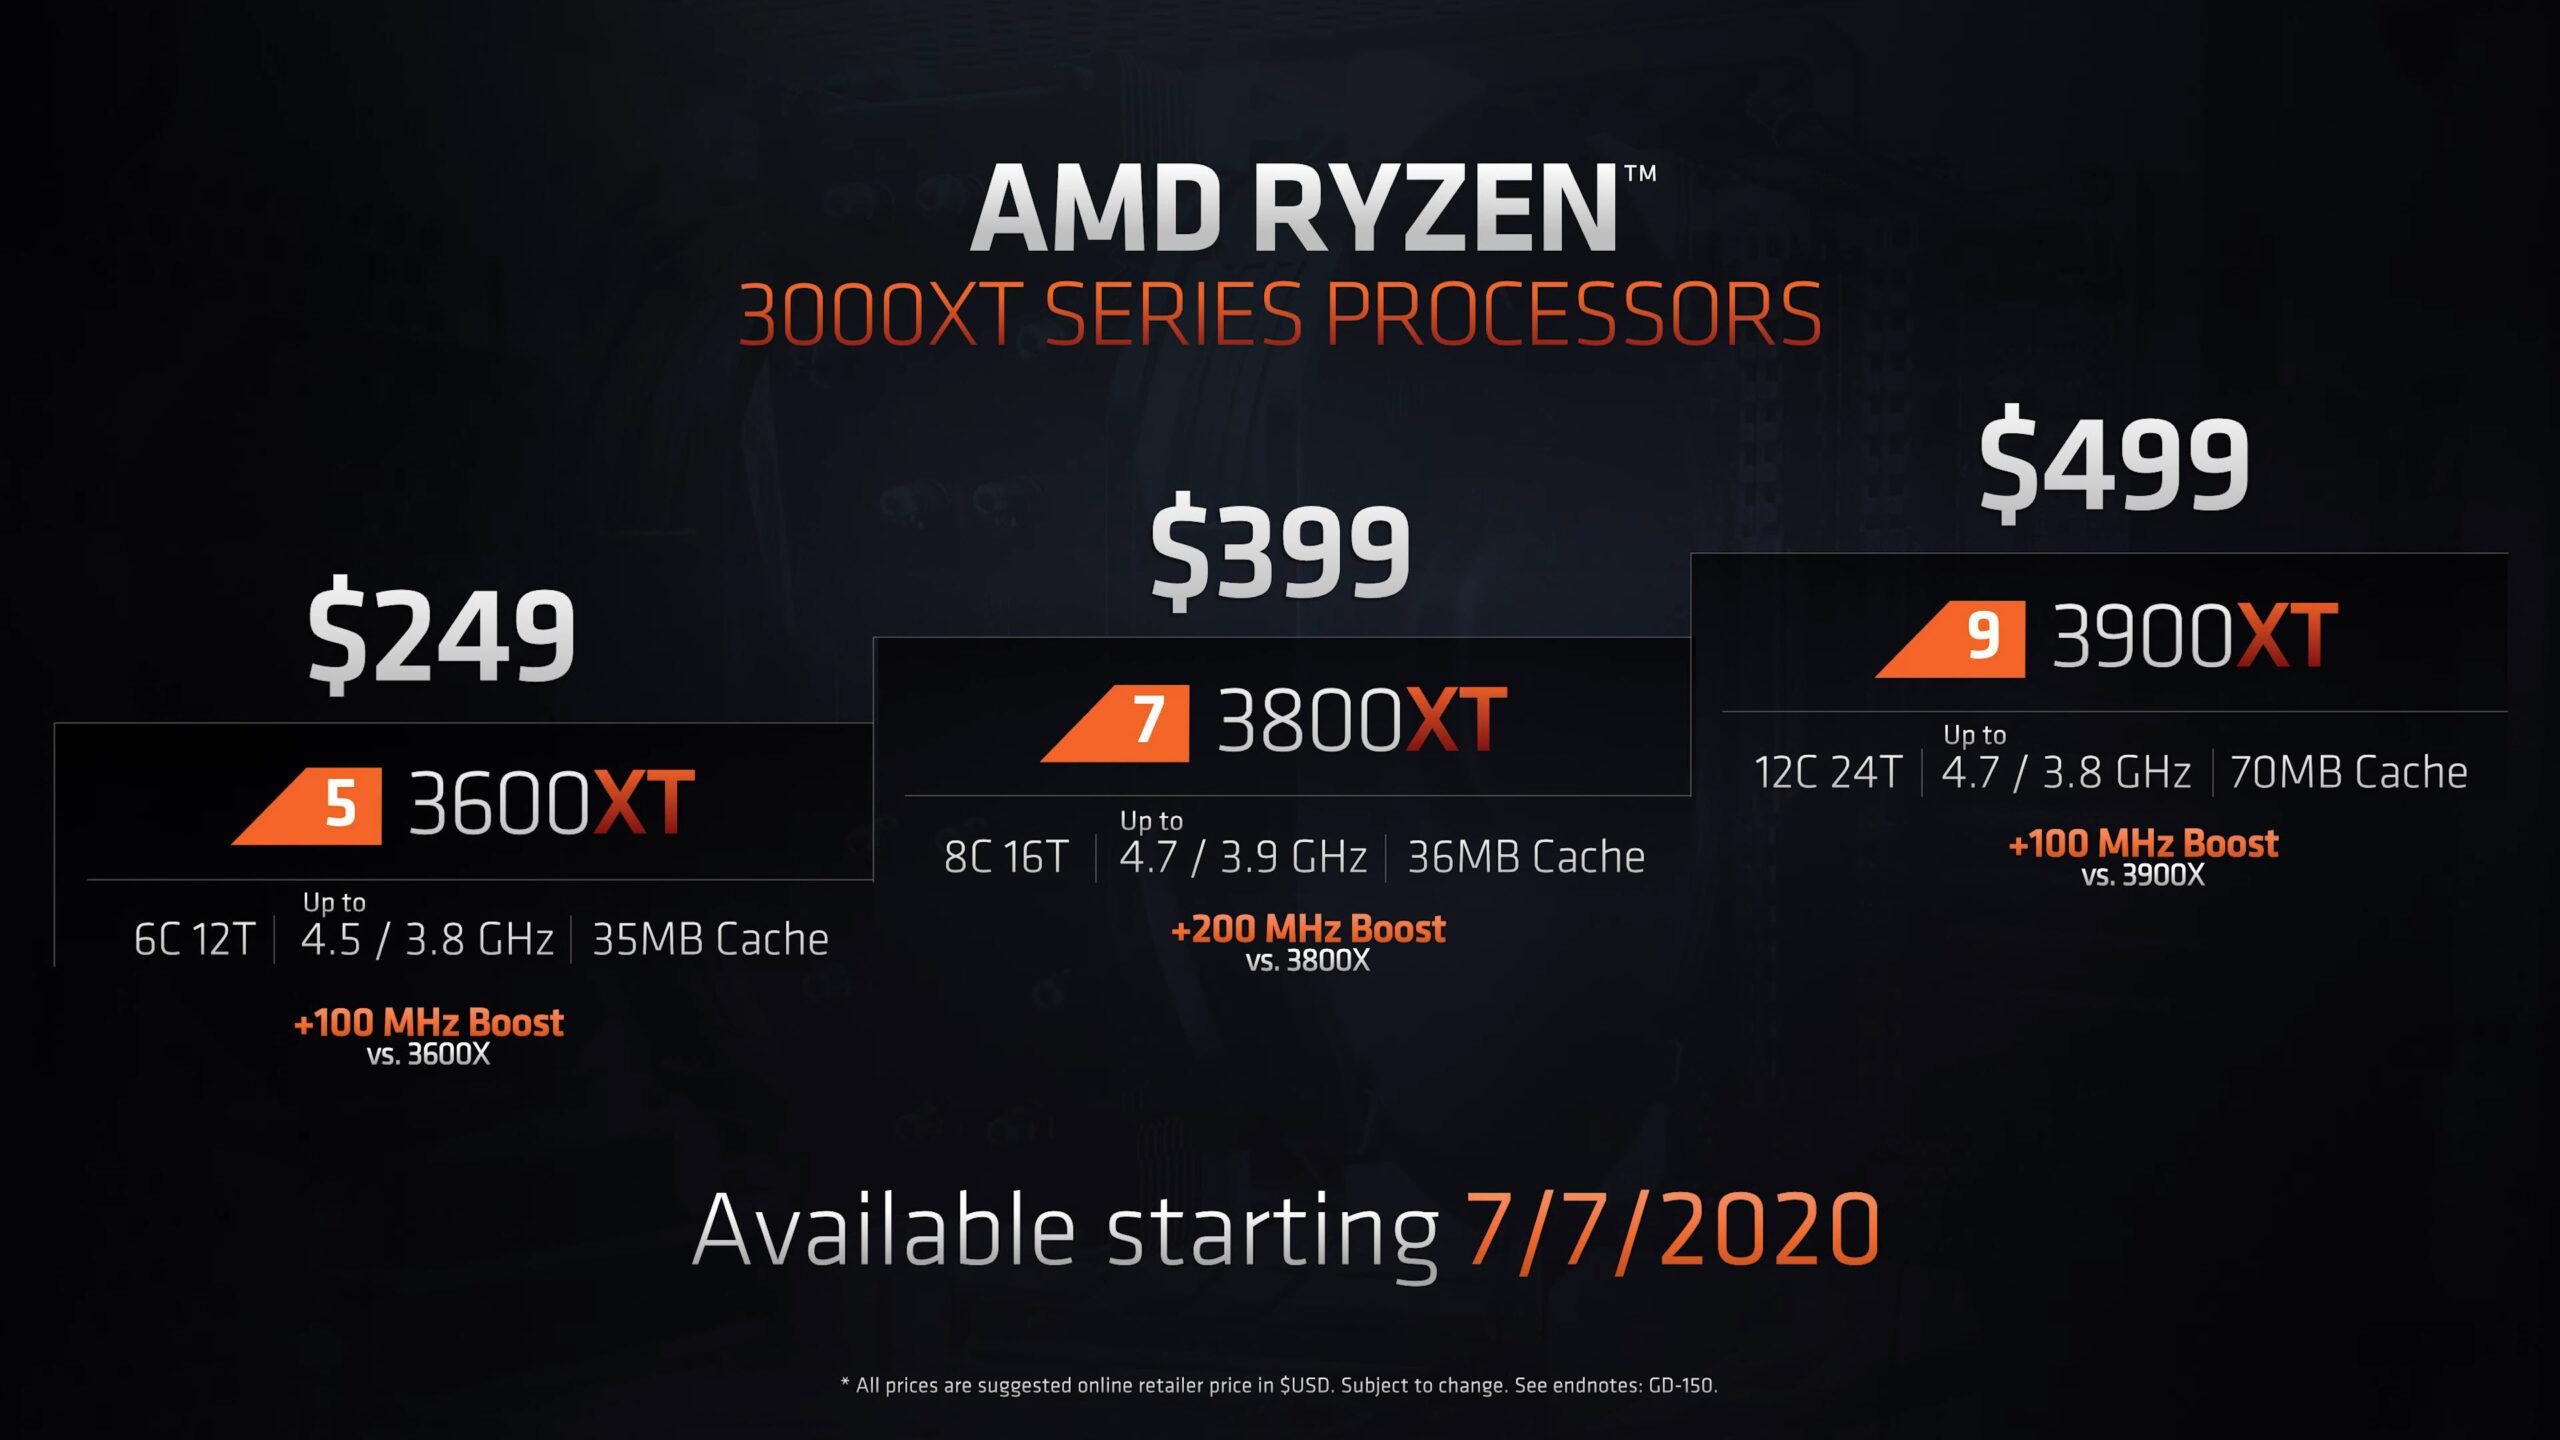 AMD Umumkan Prosesor Ryzen 3000XT Series